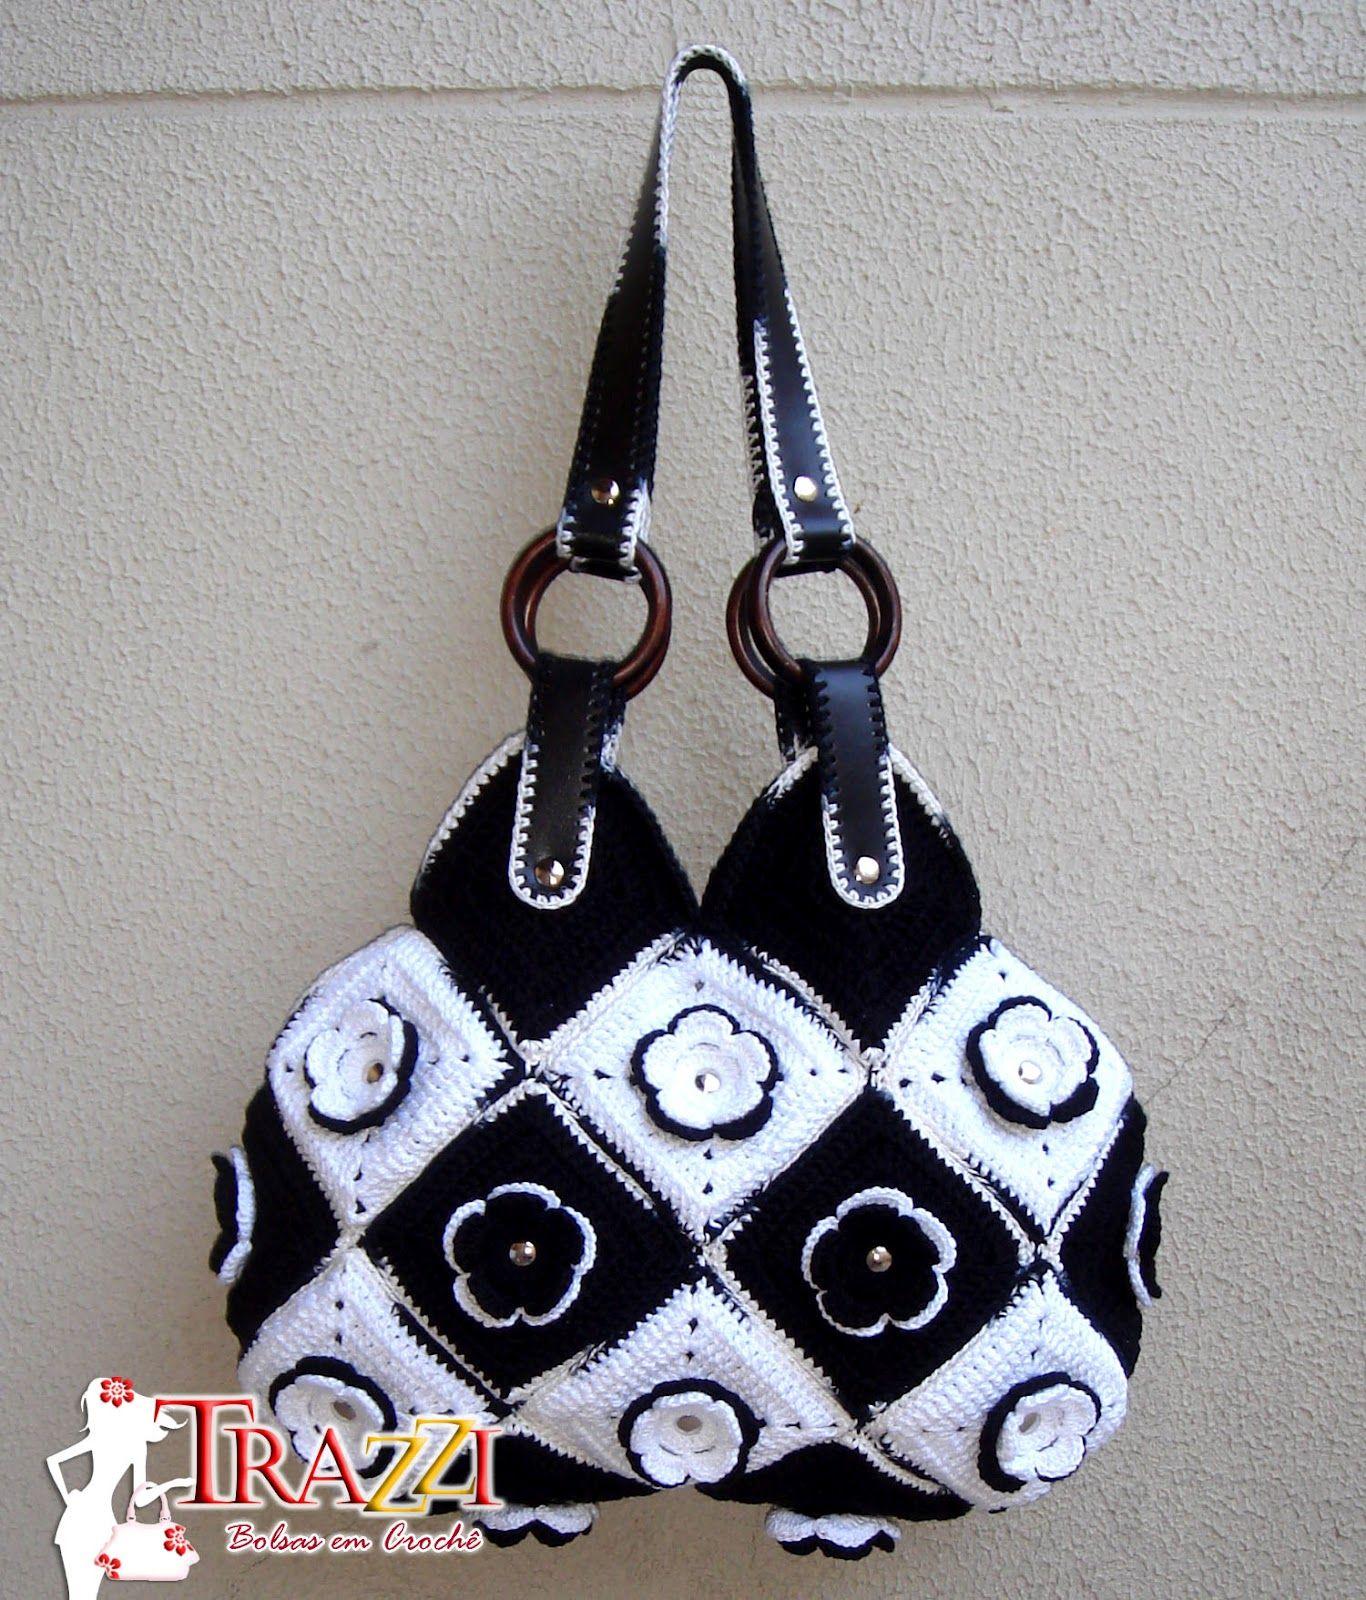 Bolsa de croche preta e branca : Crochet handbag bolsa fiore preta e branca catiele